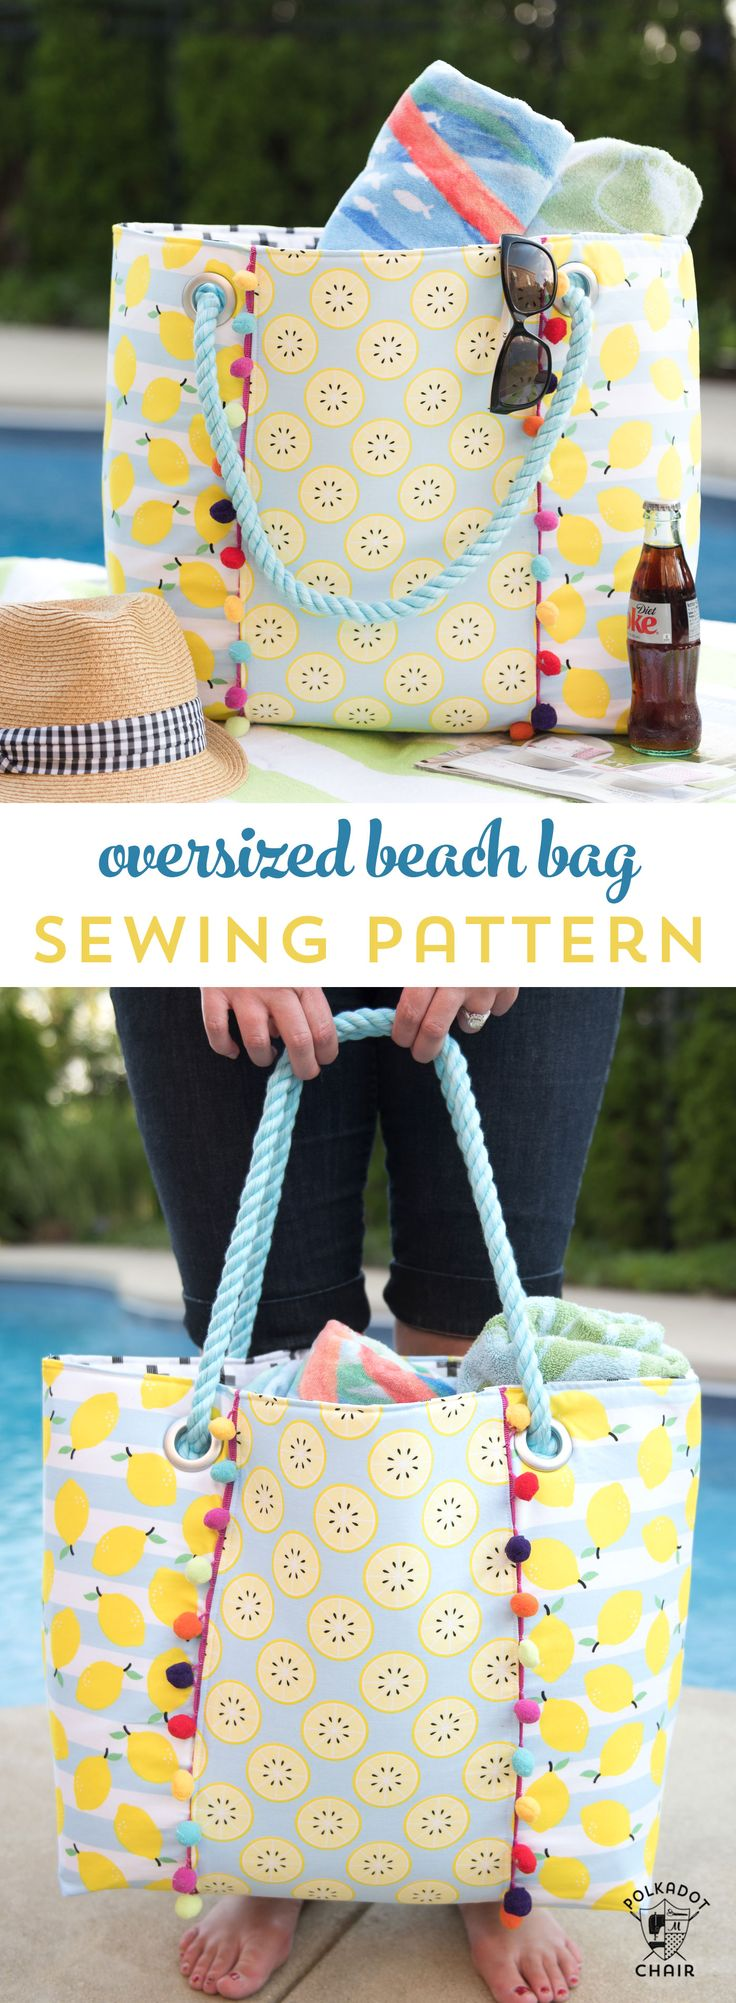 Best 25  Oversized beach bags ideas on Pinterest | Beach tote bags ...